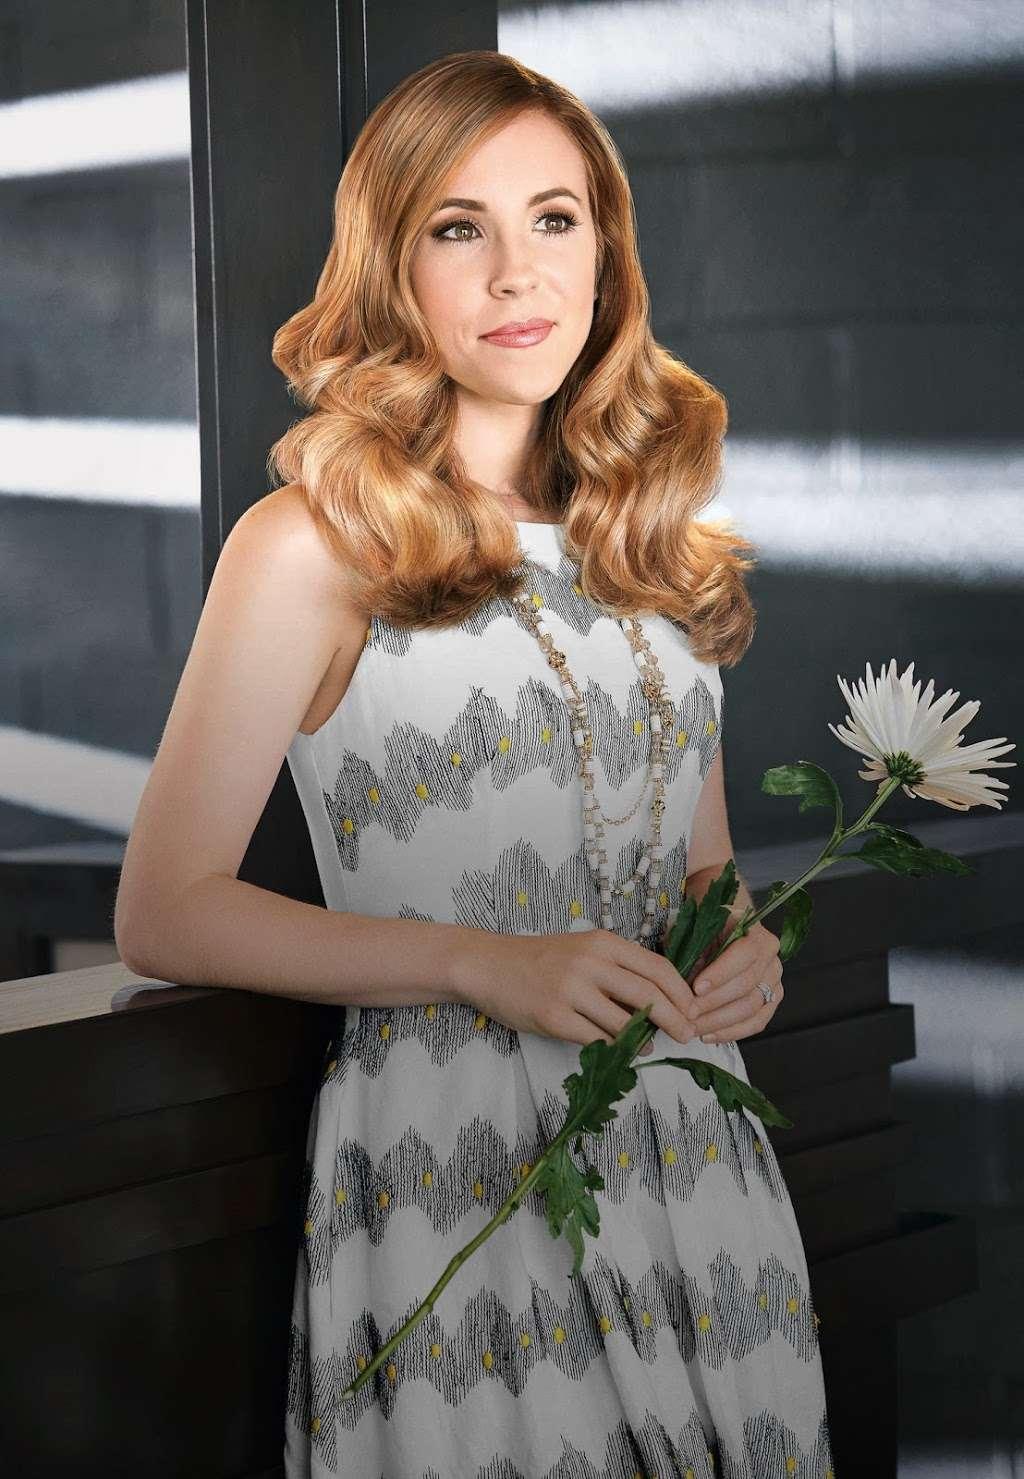 Fantastic Sams Cut & Color - hair care    Photo 2 of 7   Address: 833 S Ridge Rd, Minooka, IL 60447, USA   Phone: (815) 467-9130